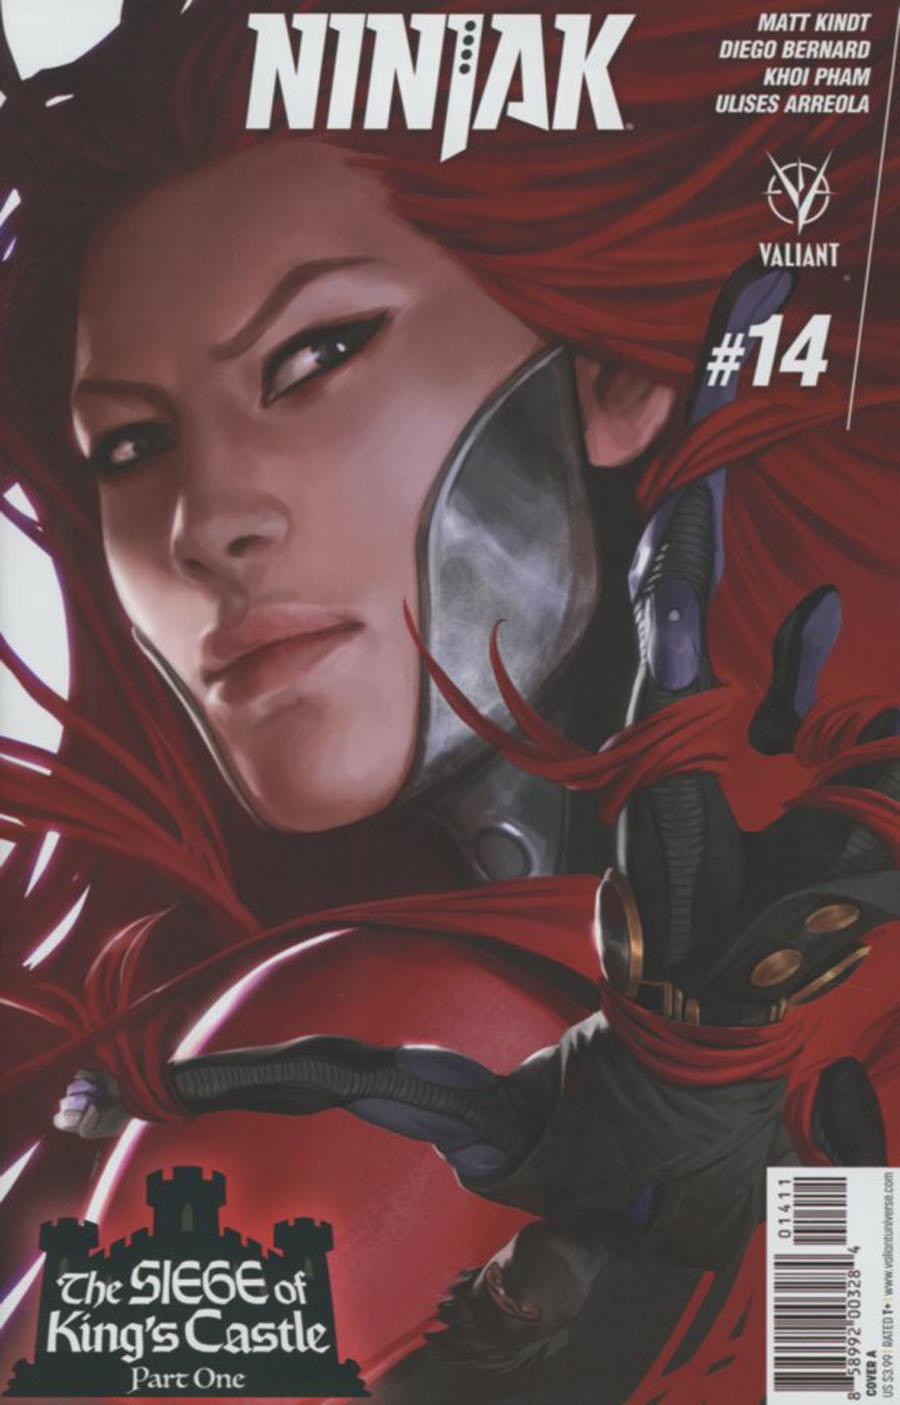 Ninjak Vol 3 #14 Cover A Regular Jelena Kevic-Djurdjevic Cover